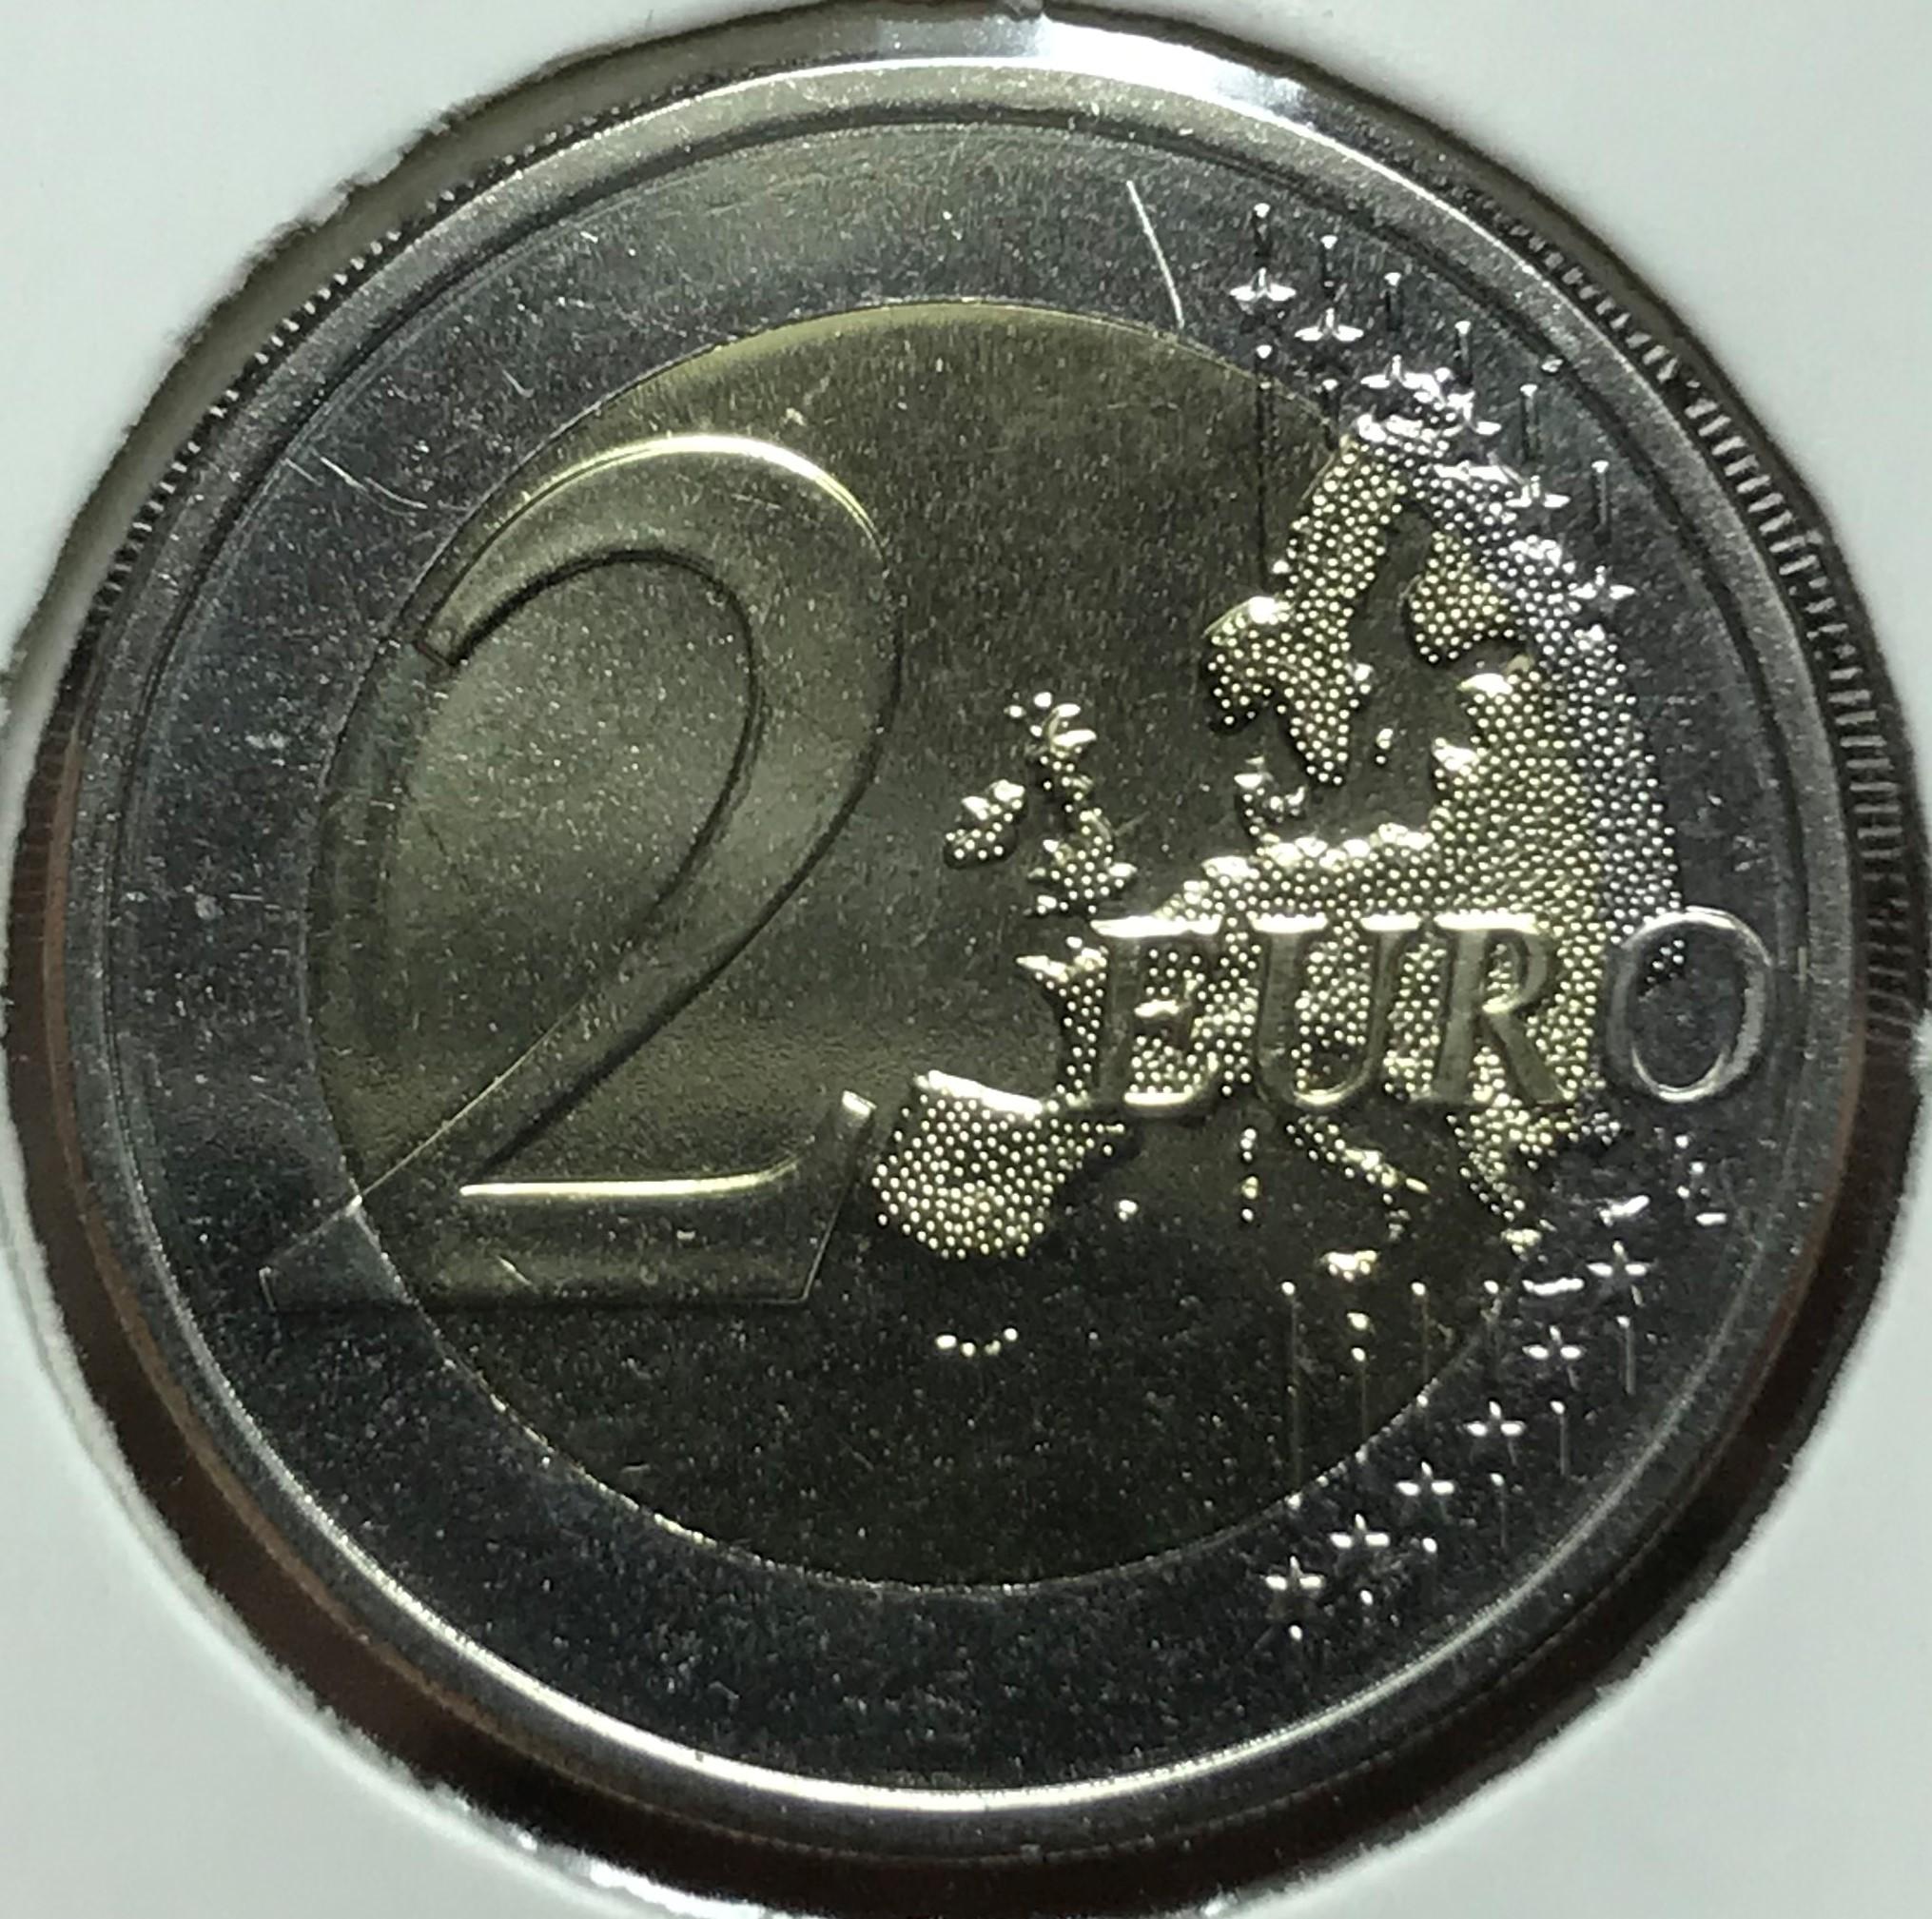 2 euro  landscape koli  finland numista country = cn country = ma